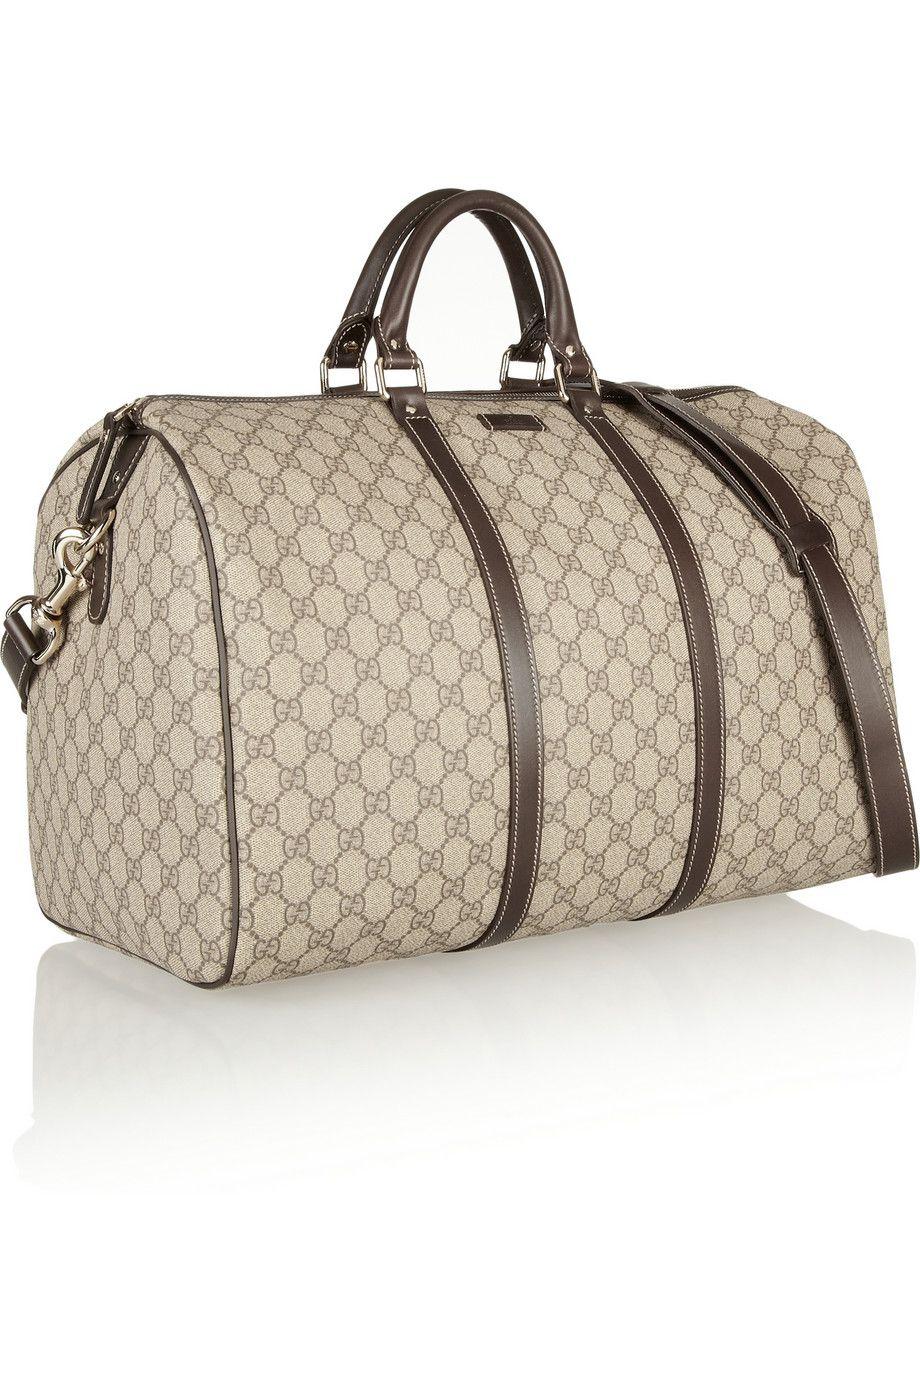 Gucci Monogrammed Canvas Weekend Bag Net A Porter Com